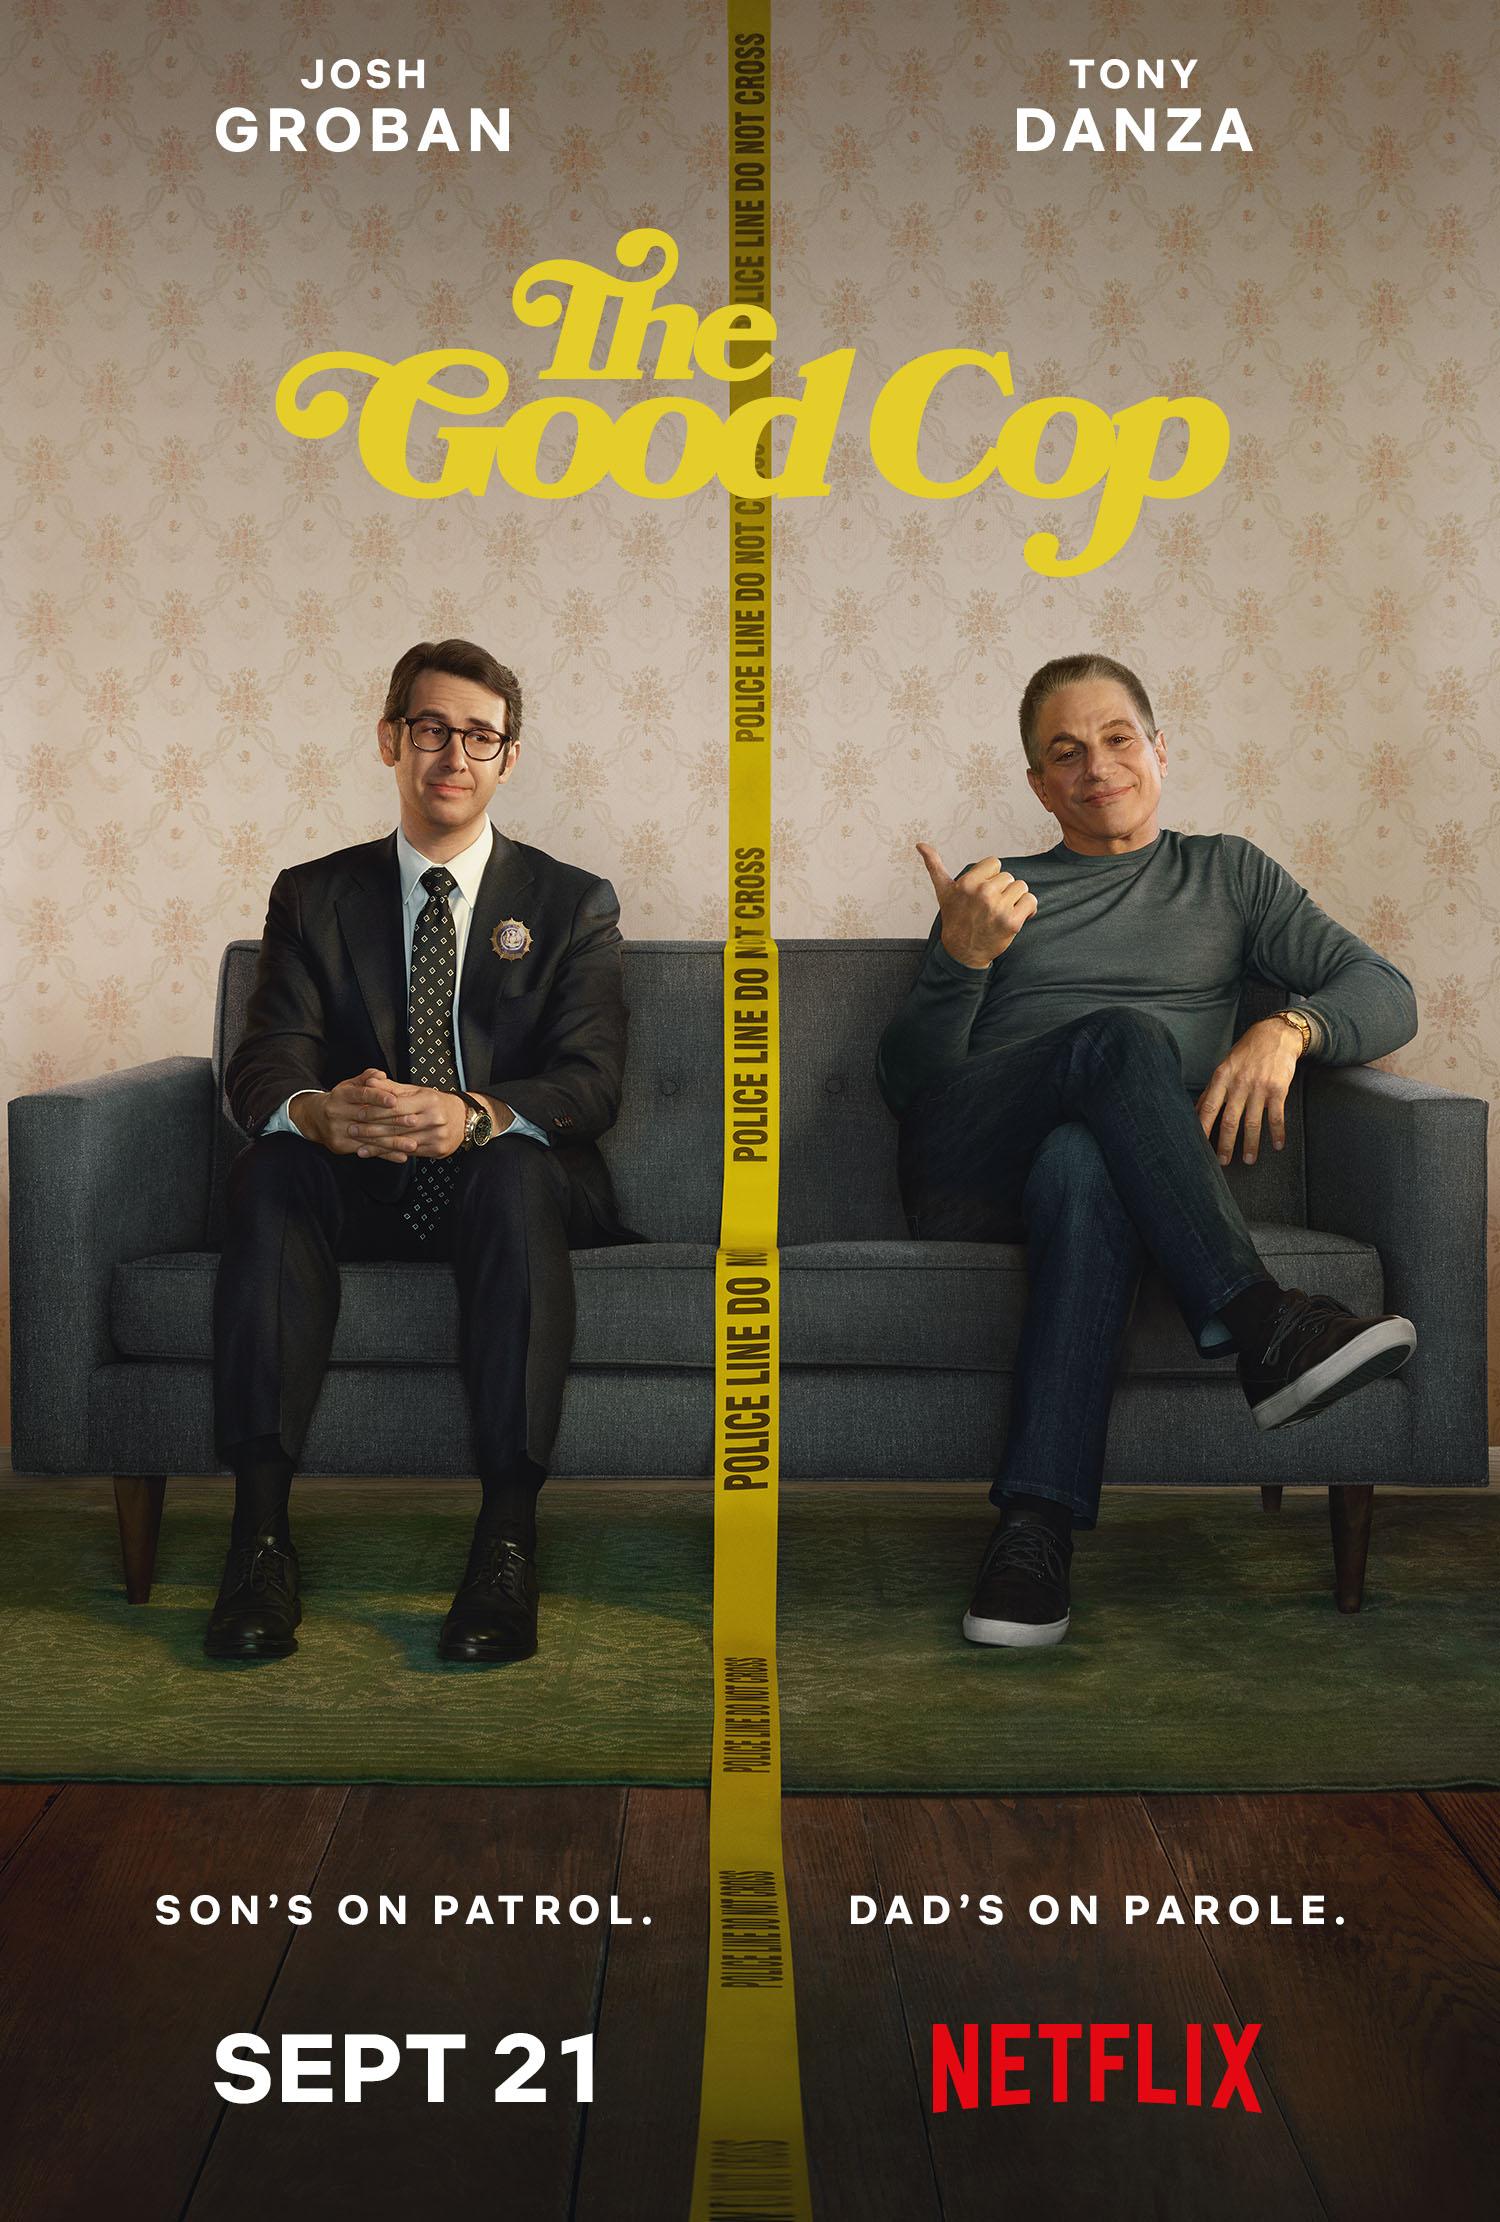 THE_GOOD_COP_Vertical-Main_PRE_US.jpg